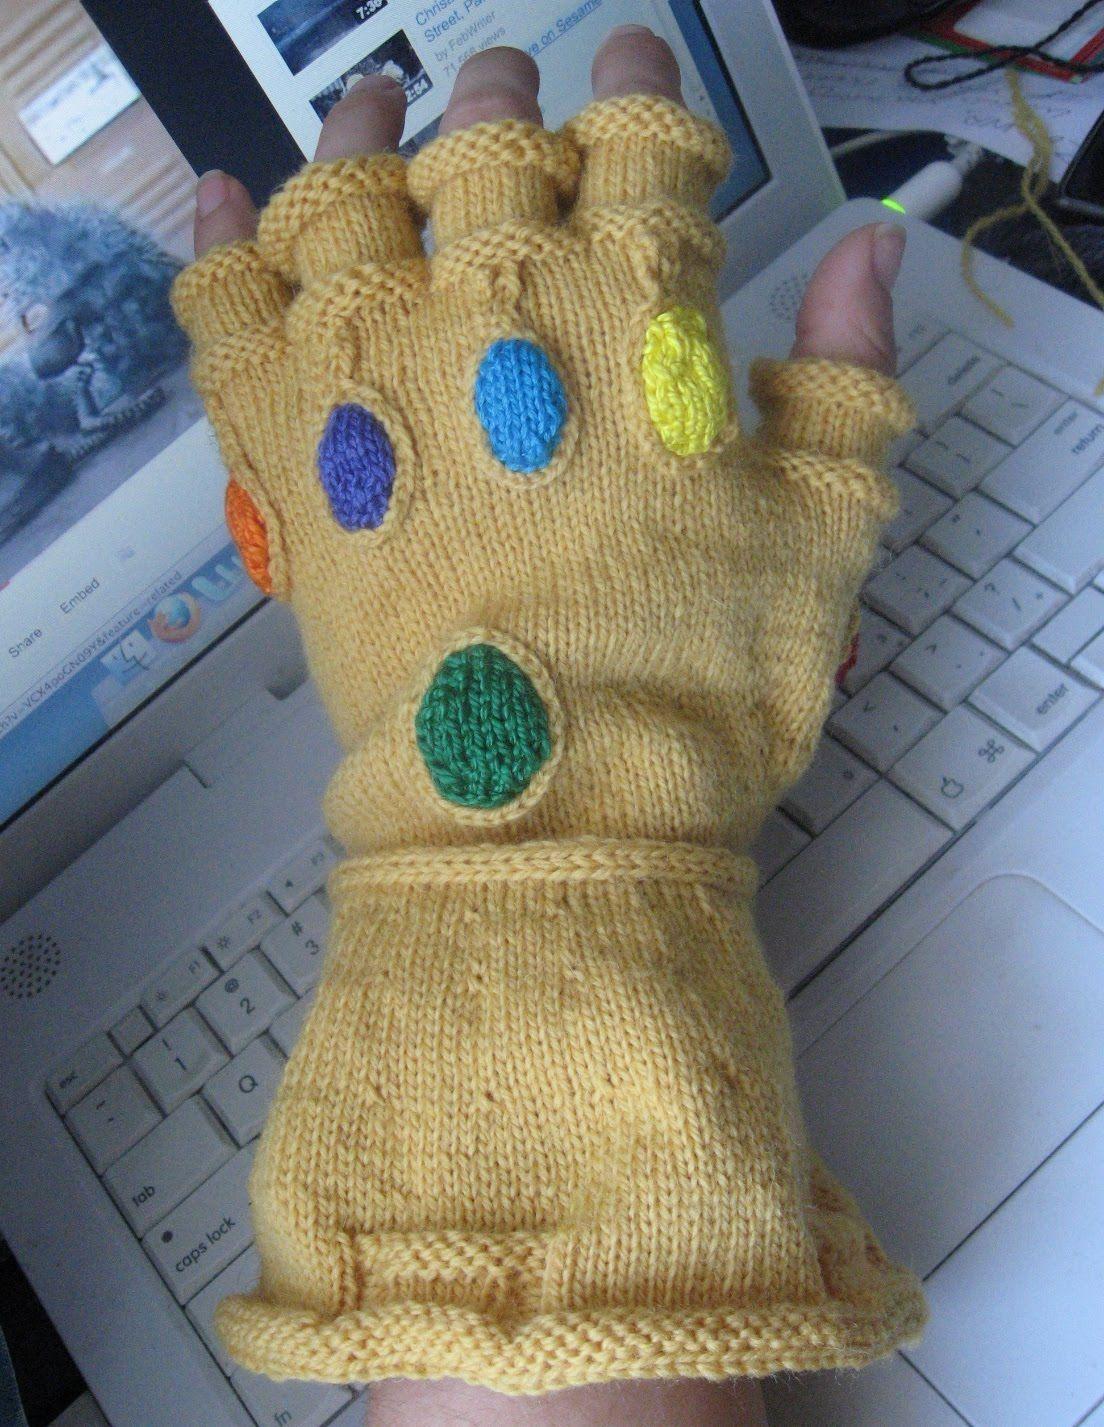 Making It Up As I Go December 2010 Knitted Baby Cardigan Crochet Crochet Gloves